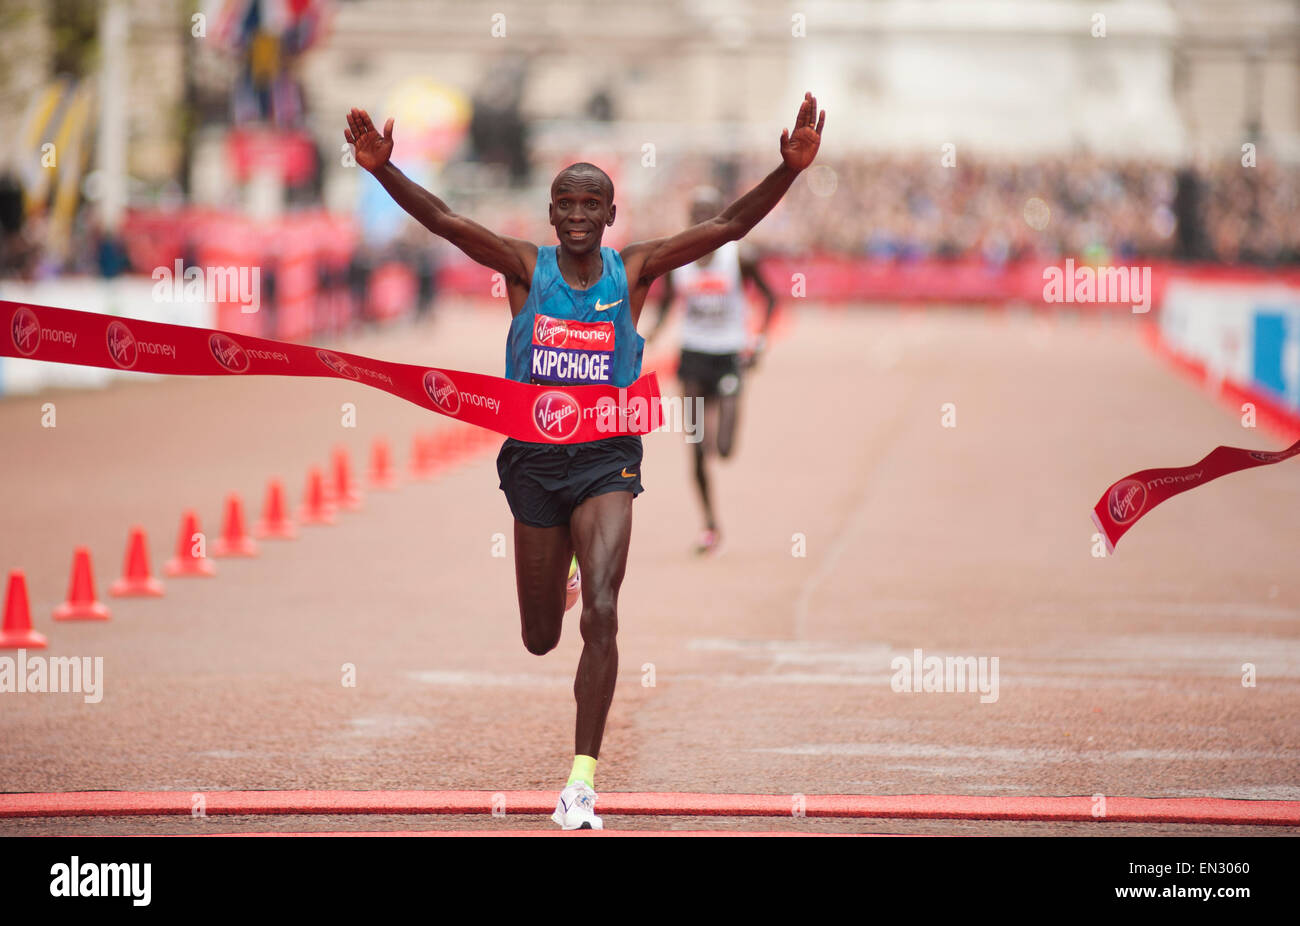 Eliud Kipchoge del Kenya vince il denaro VIRGIN LONDON MARATHON 2015 02:04:42 con Wilson Kipsang del Kenya secondo Immagini Stock